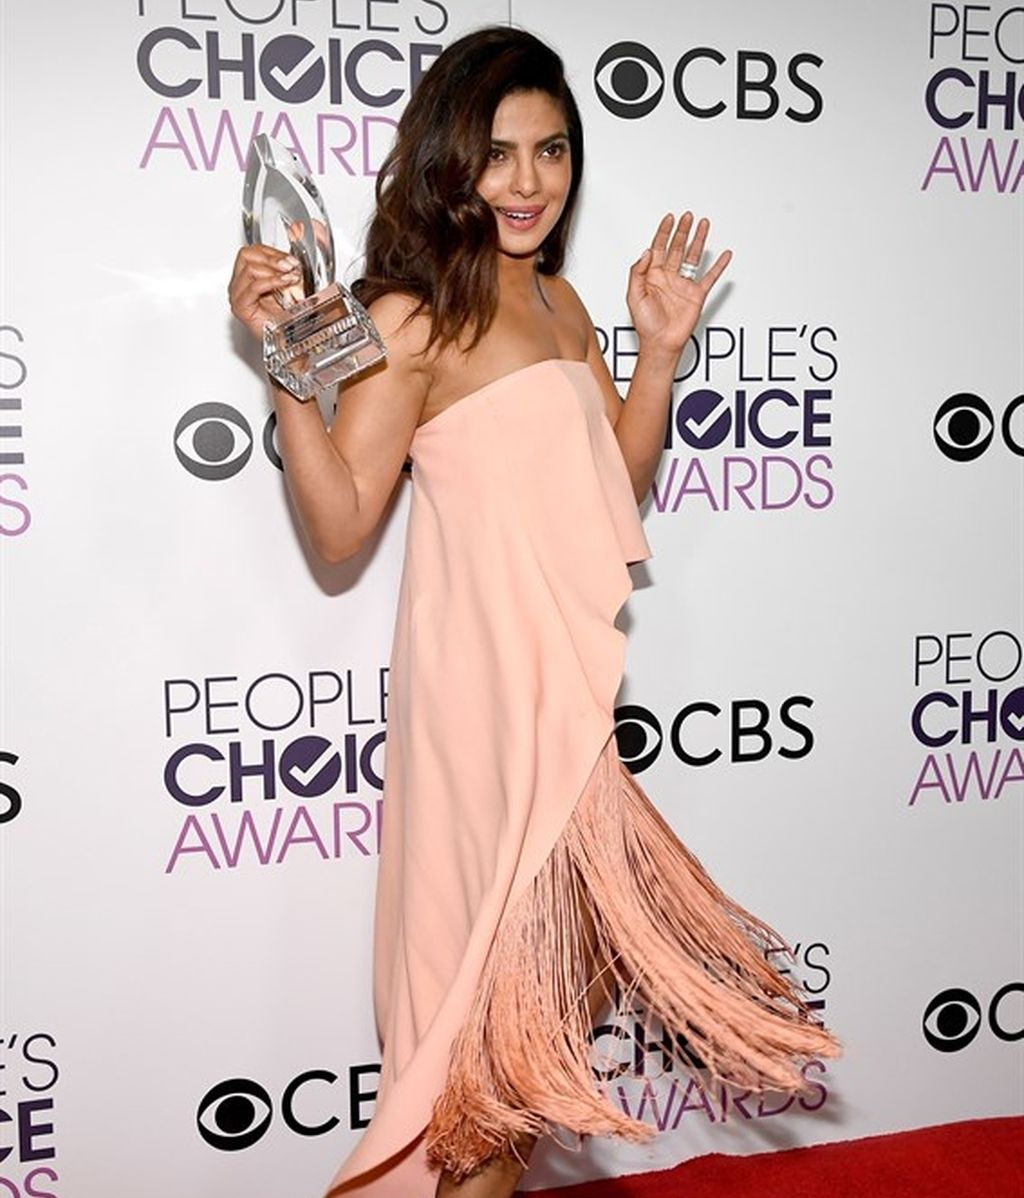 Priyanka Chopra en los People Choice Awards 2017